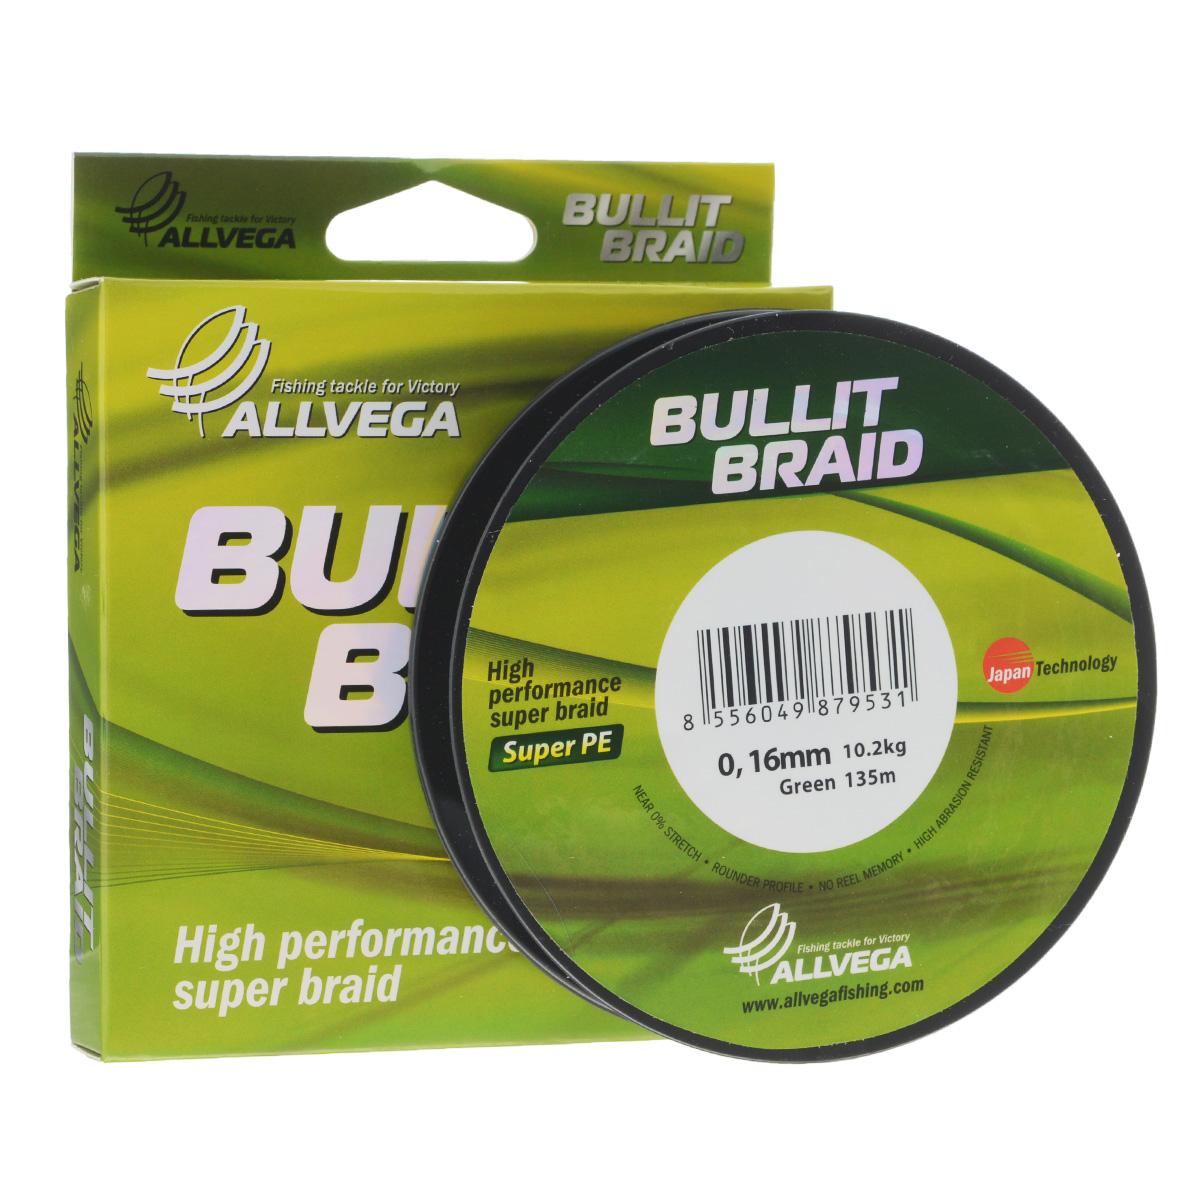 Леска плетеная Allvega Bullit Braid, цвет: темно-зеленый, 135 м, 0,16 мм, 10,2 кг